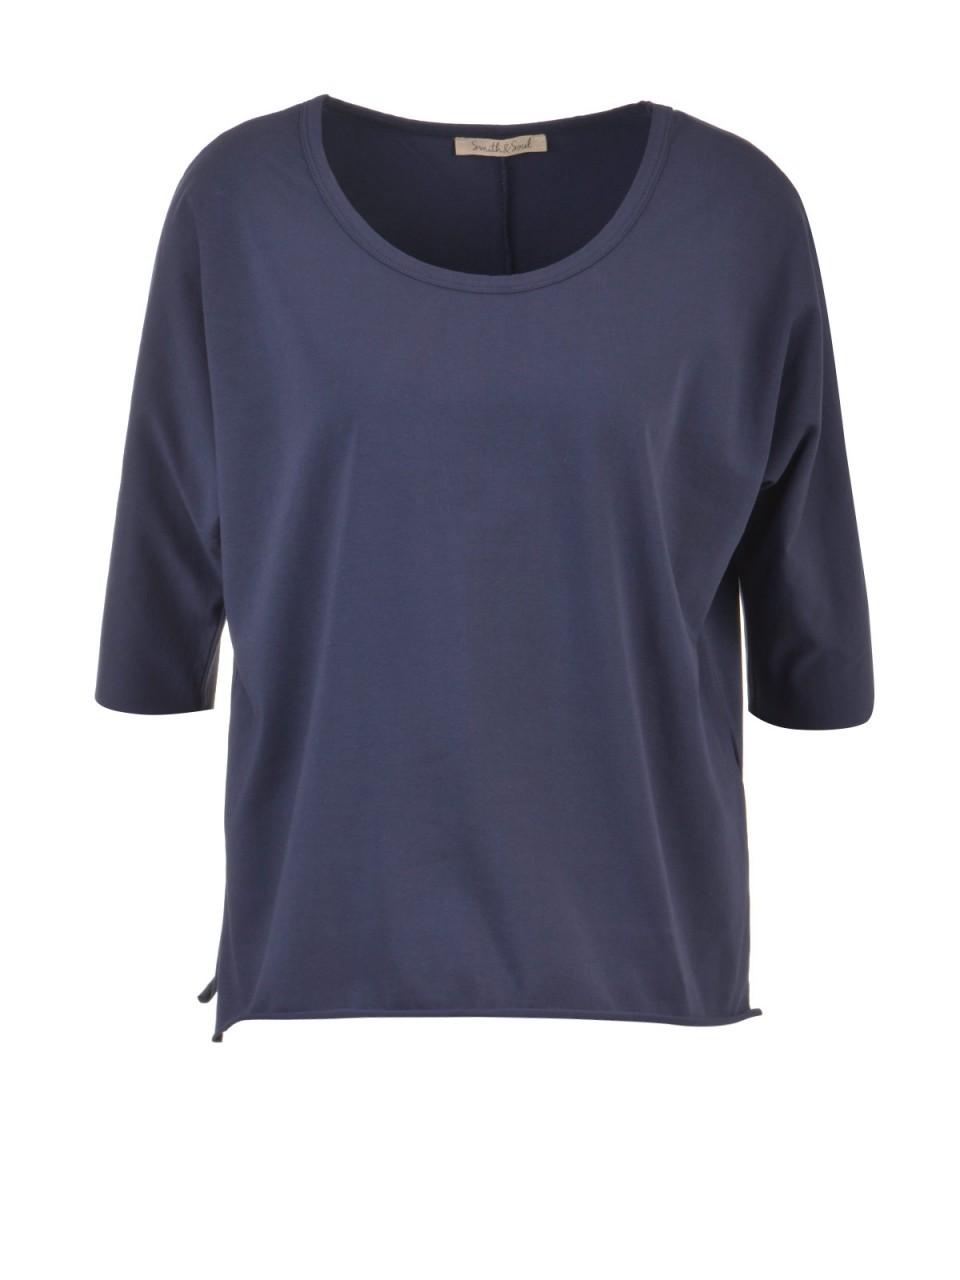 smith-amp-soul-damen-t-shirt-navy